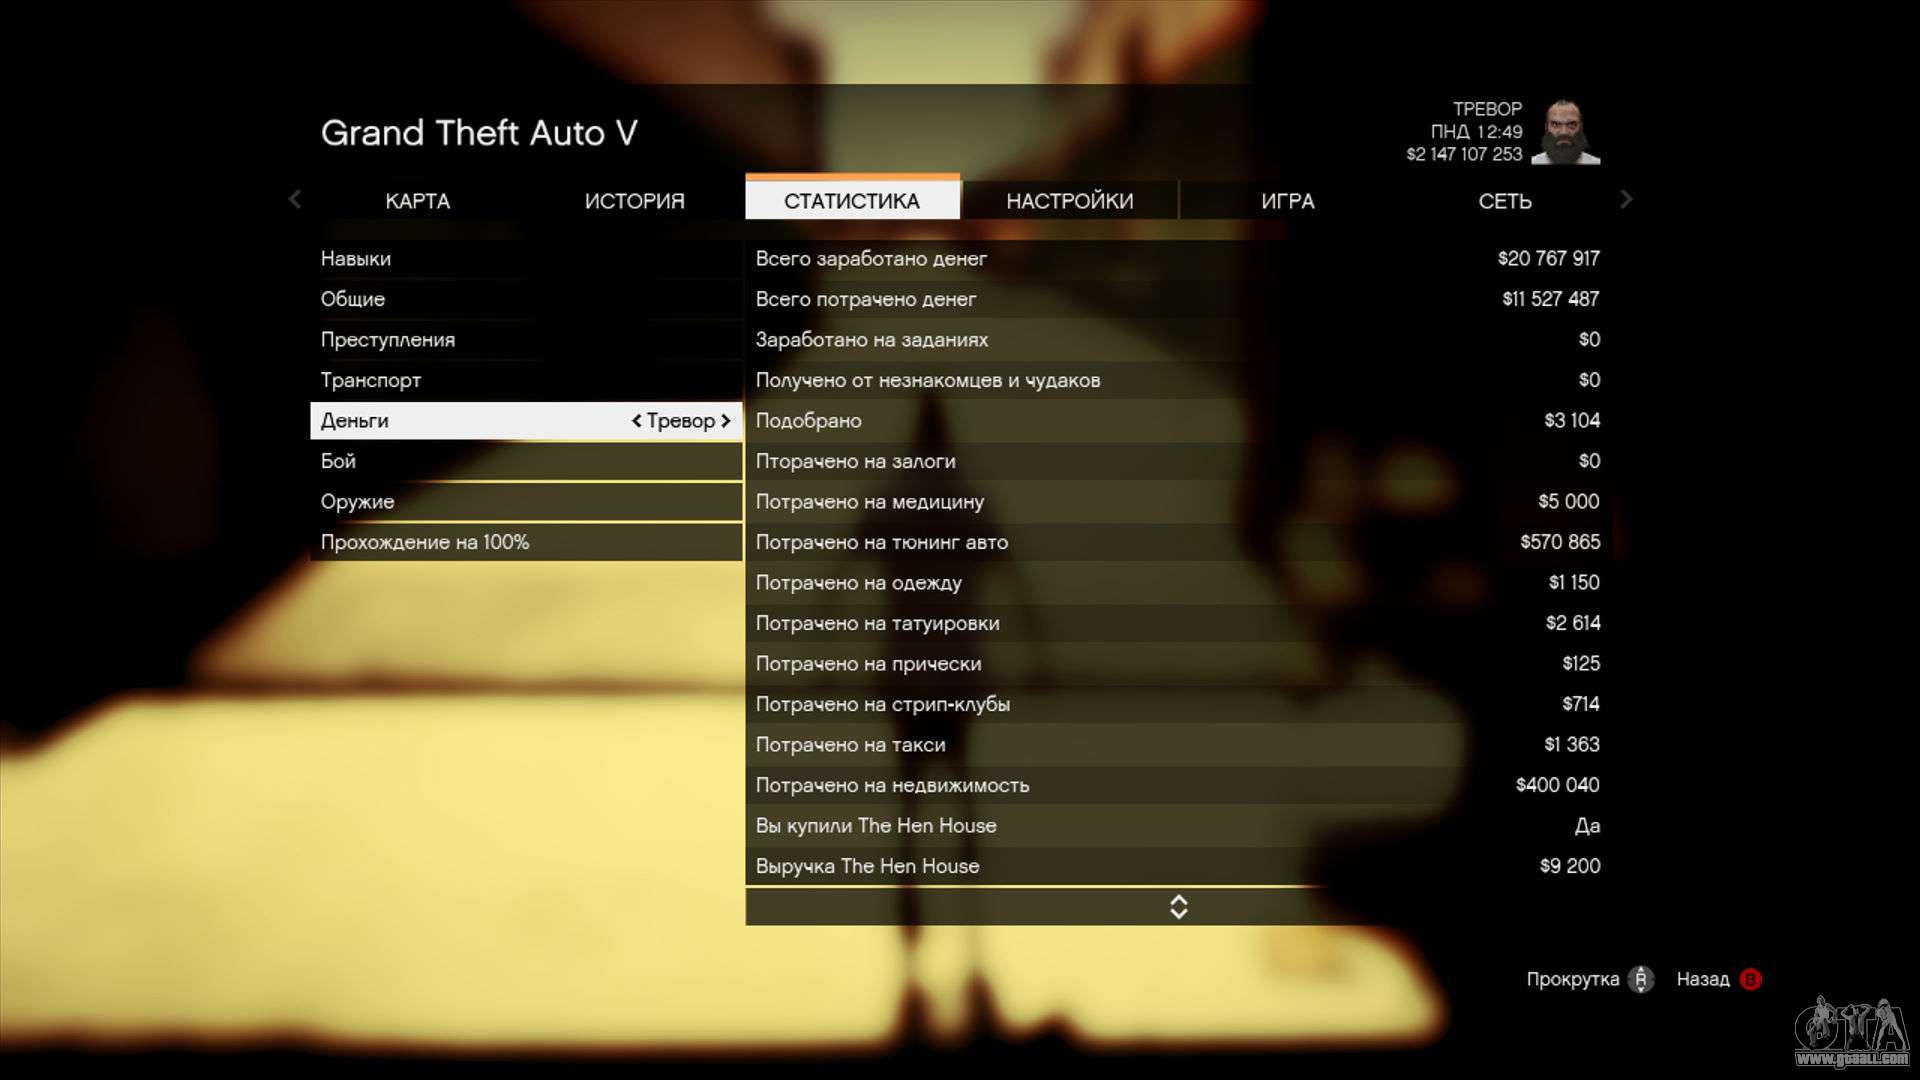 Save Gta 5 100 And 1 Billion Xbox 360 For Gta 5